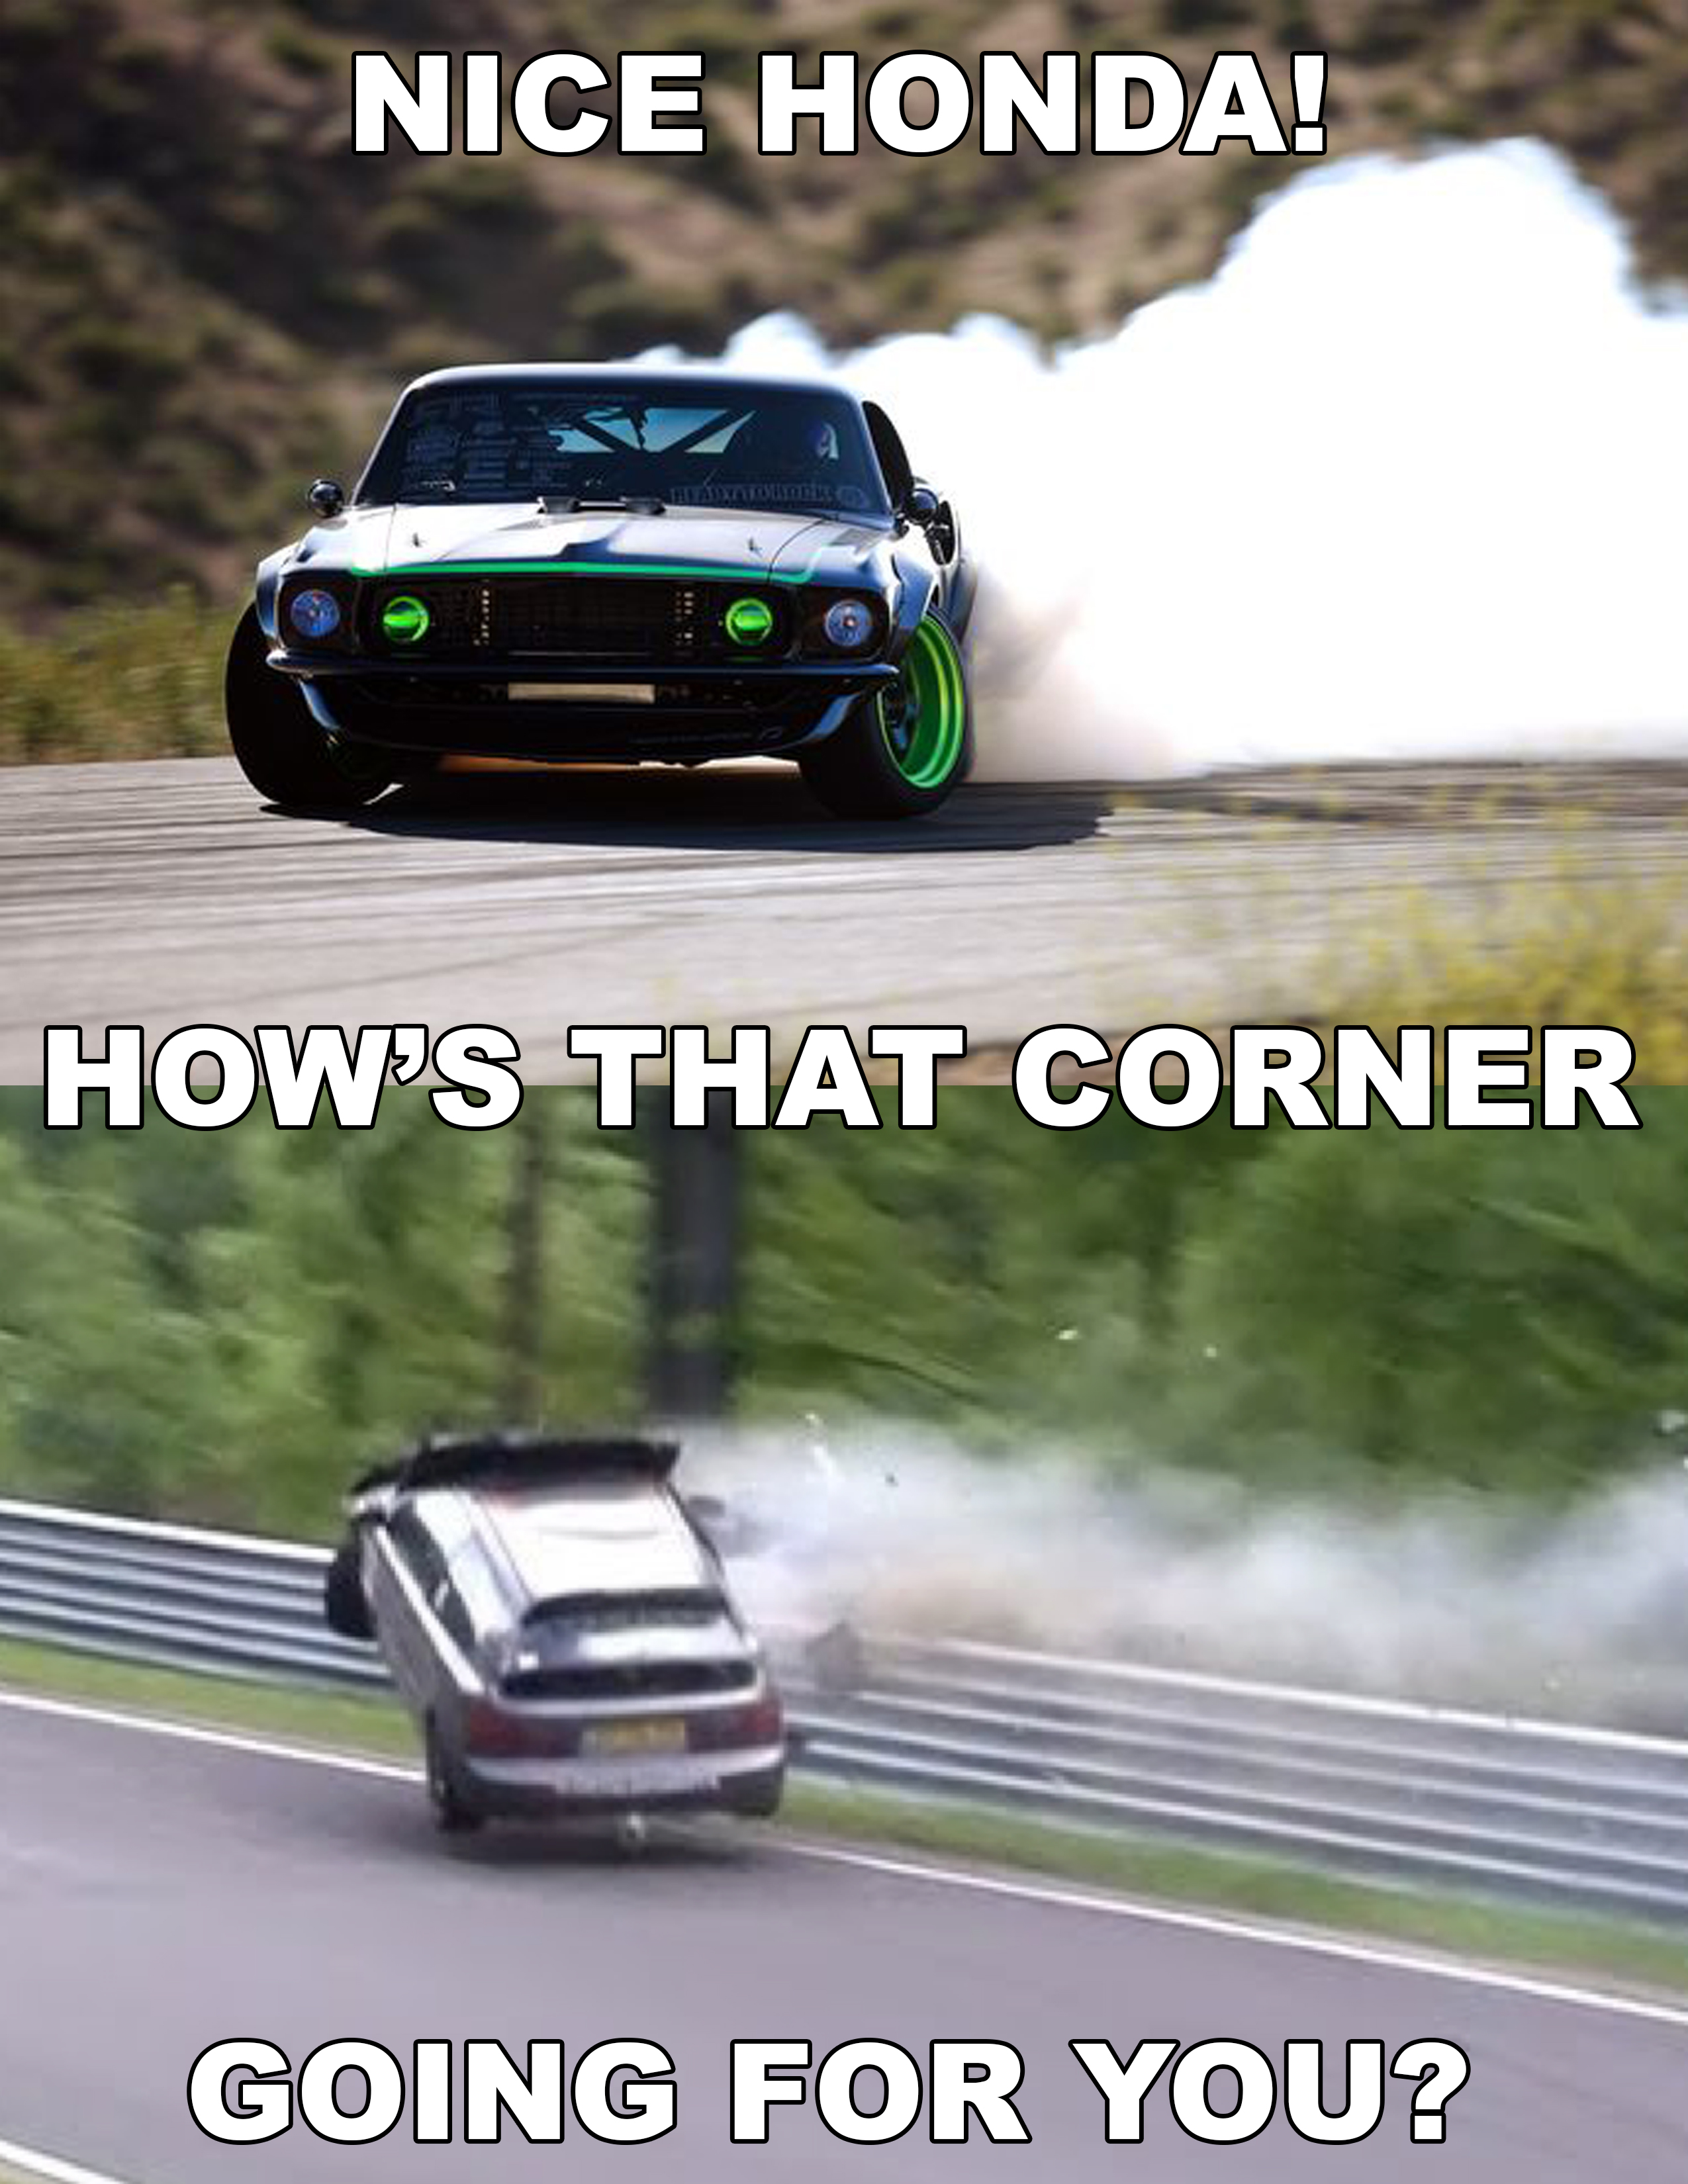 mvh 556e1c6ec4c87 ford vs dodge memes meme center